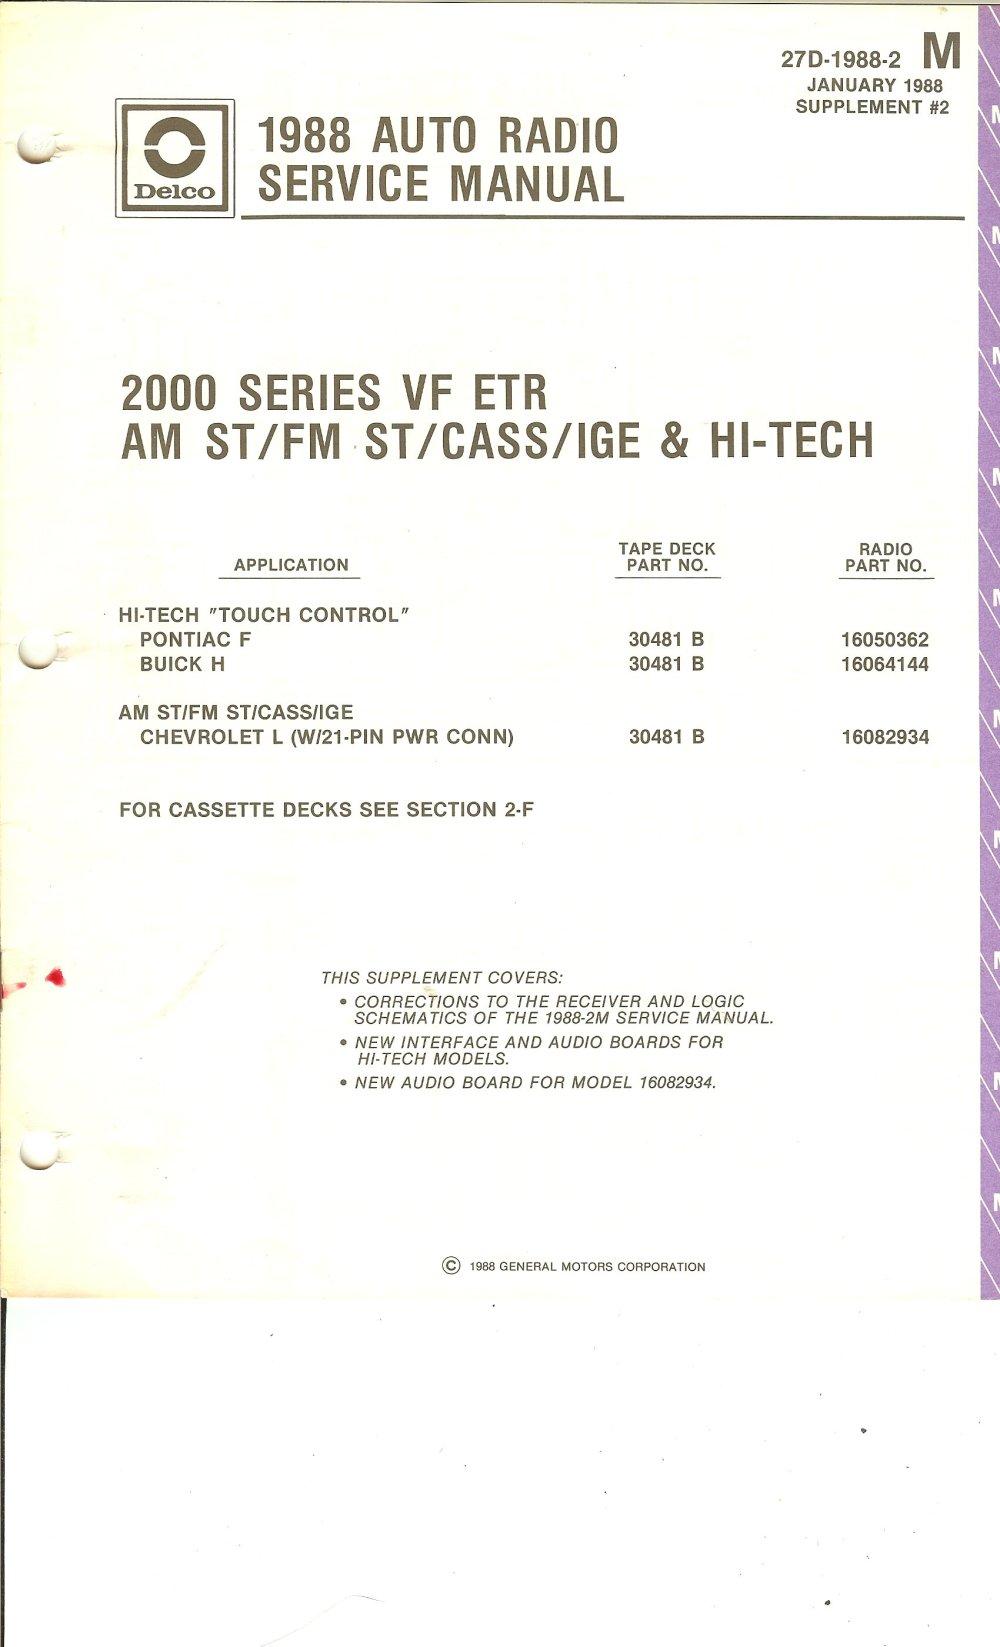 medium resolution of delco 2700 wiring diagram damaged delco repair third generation f body message boardsswitch jpg damaged delco repair manual